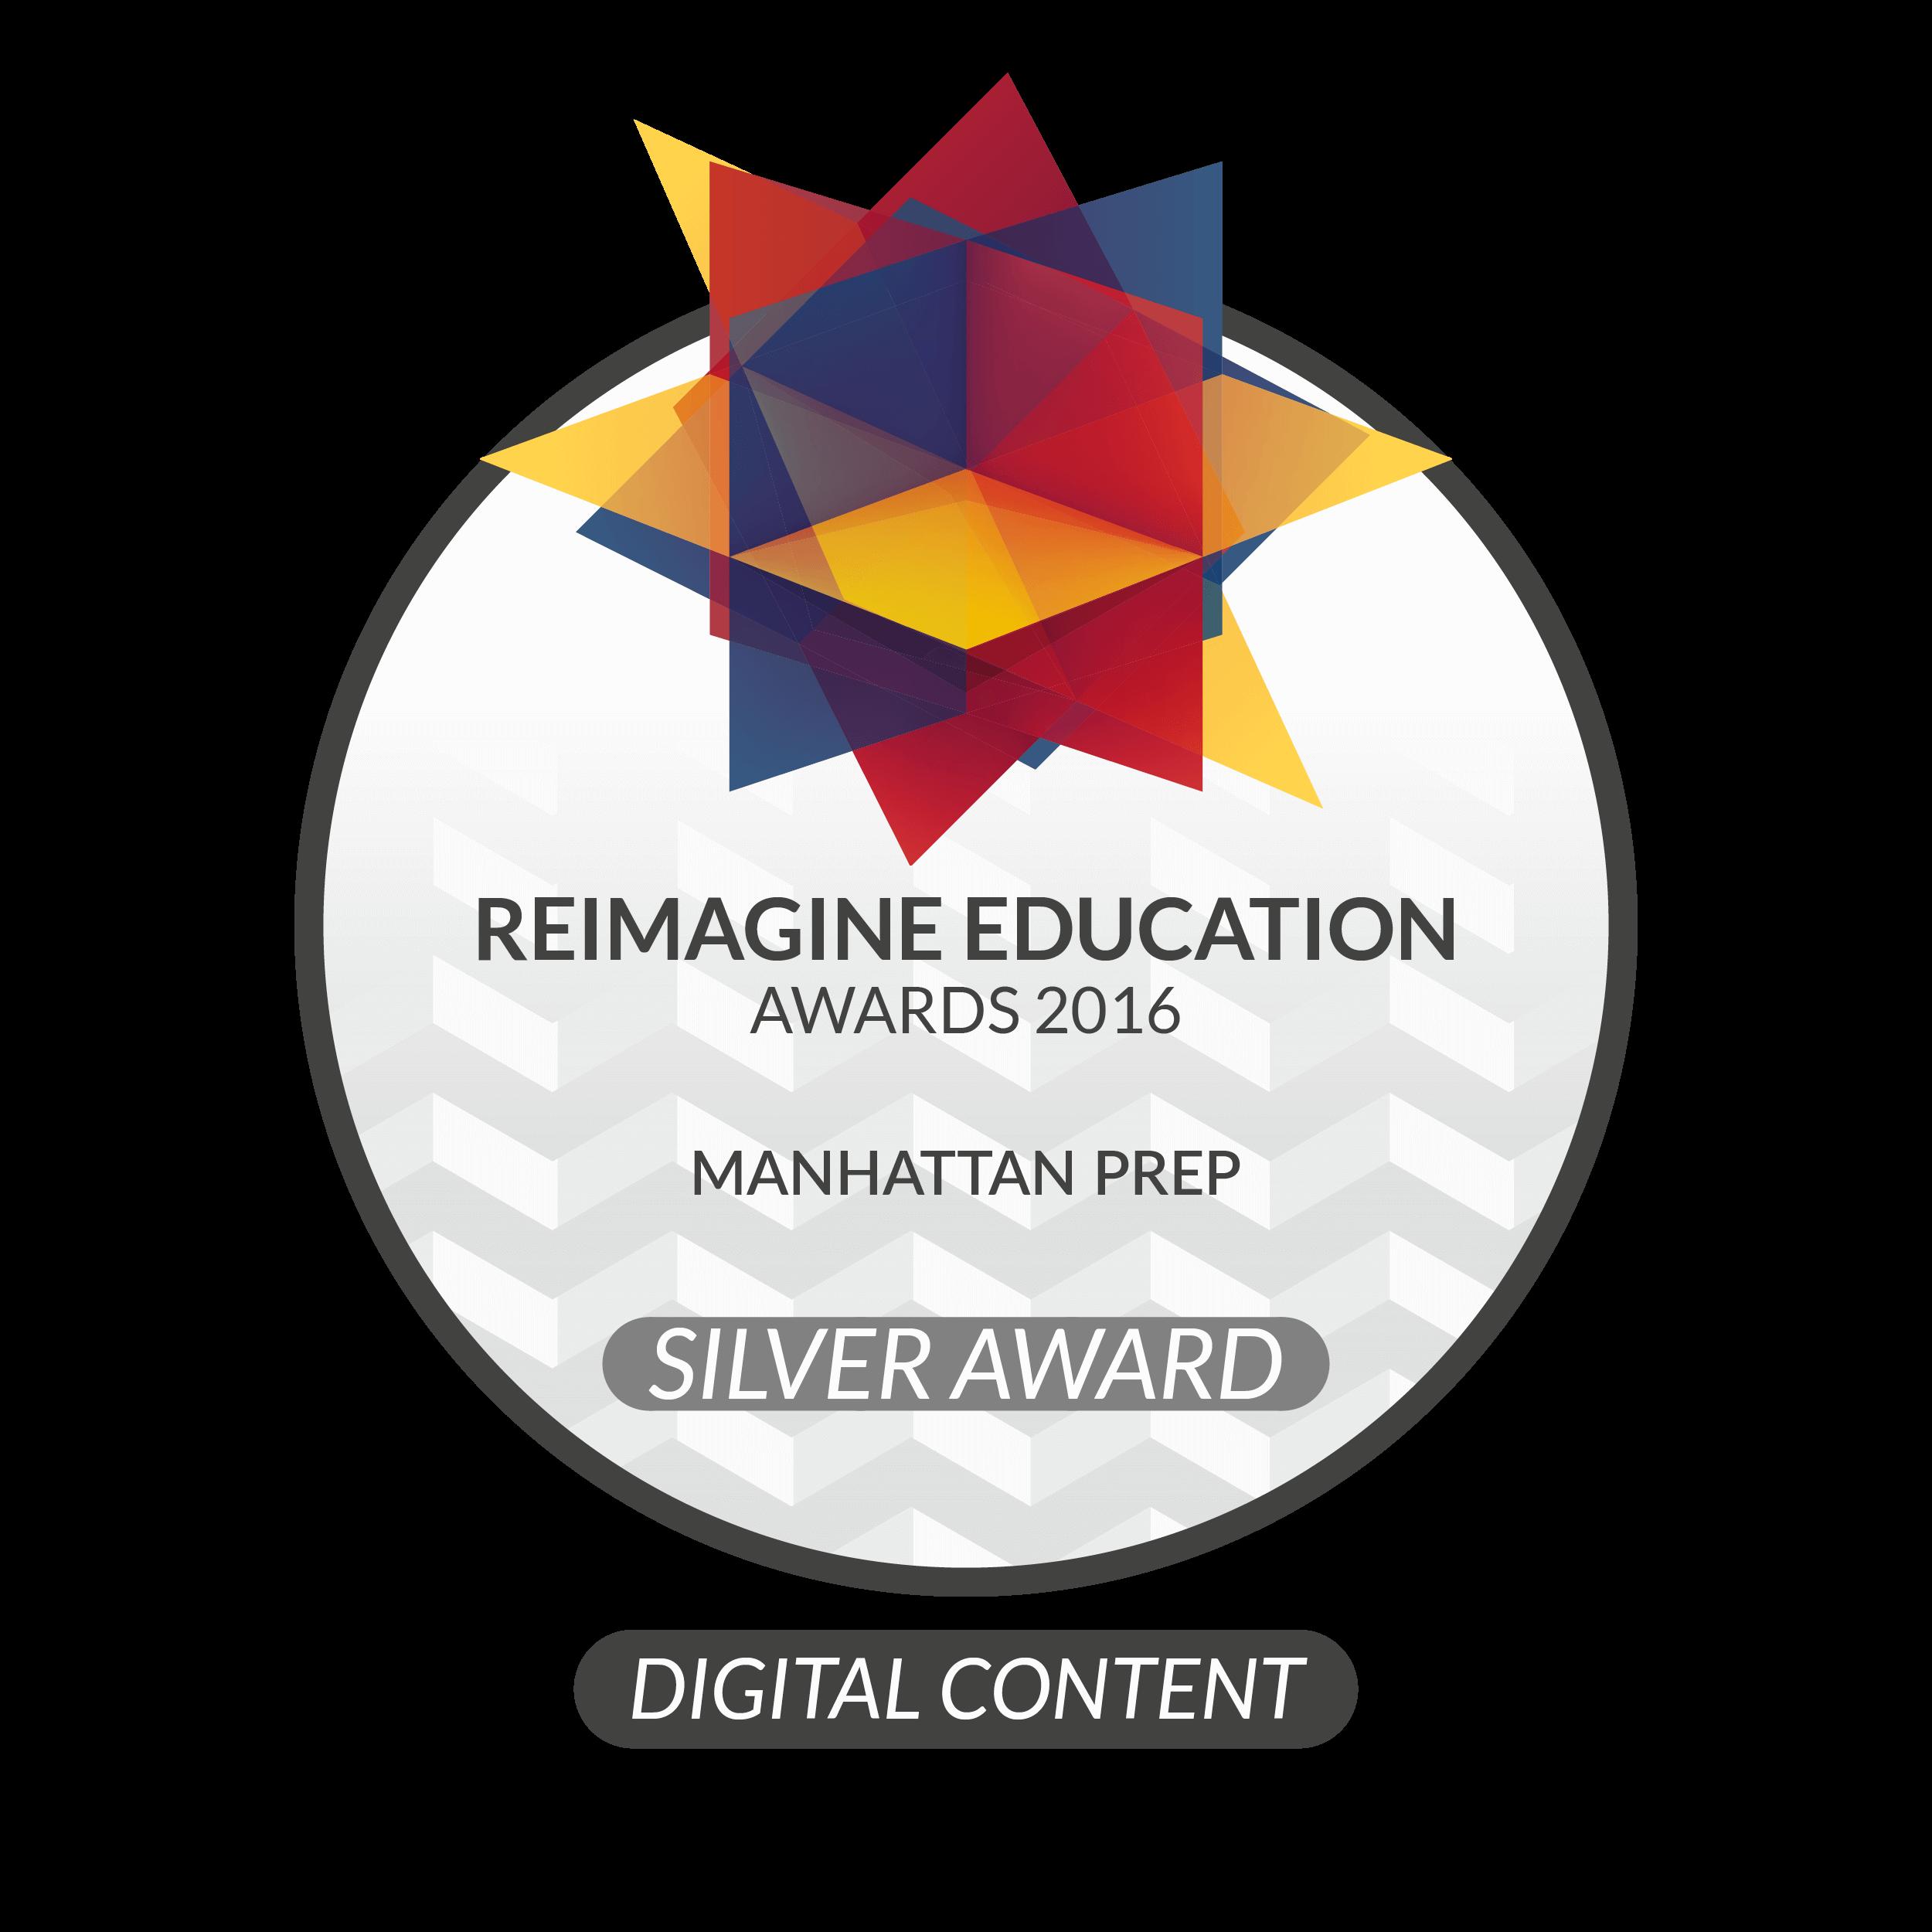 Reimagine Education Awards 2016 Digital Content Award Manhattan Prep GMAT LSAT Interact Badge